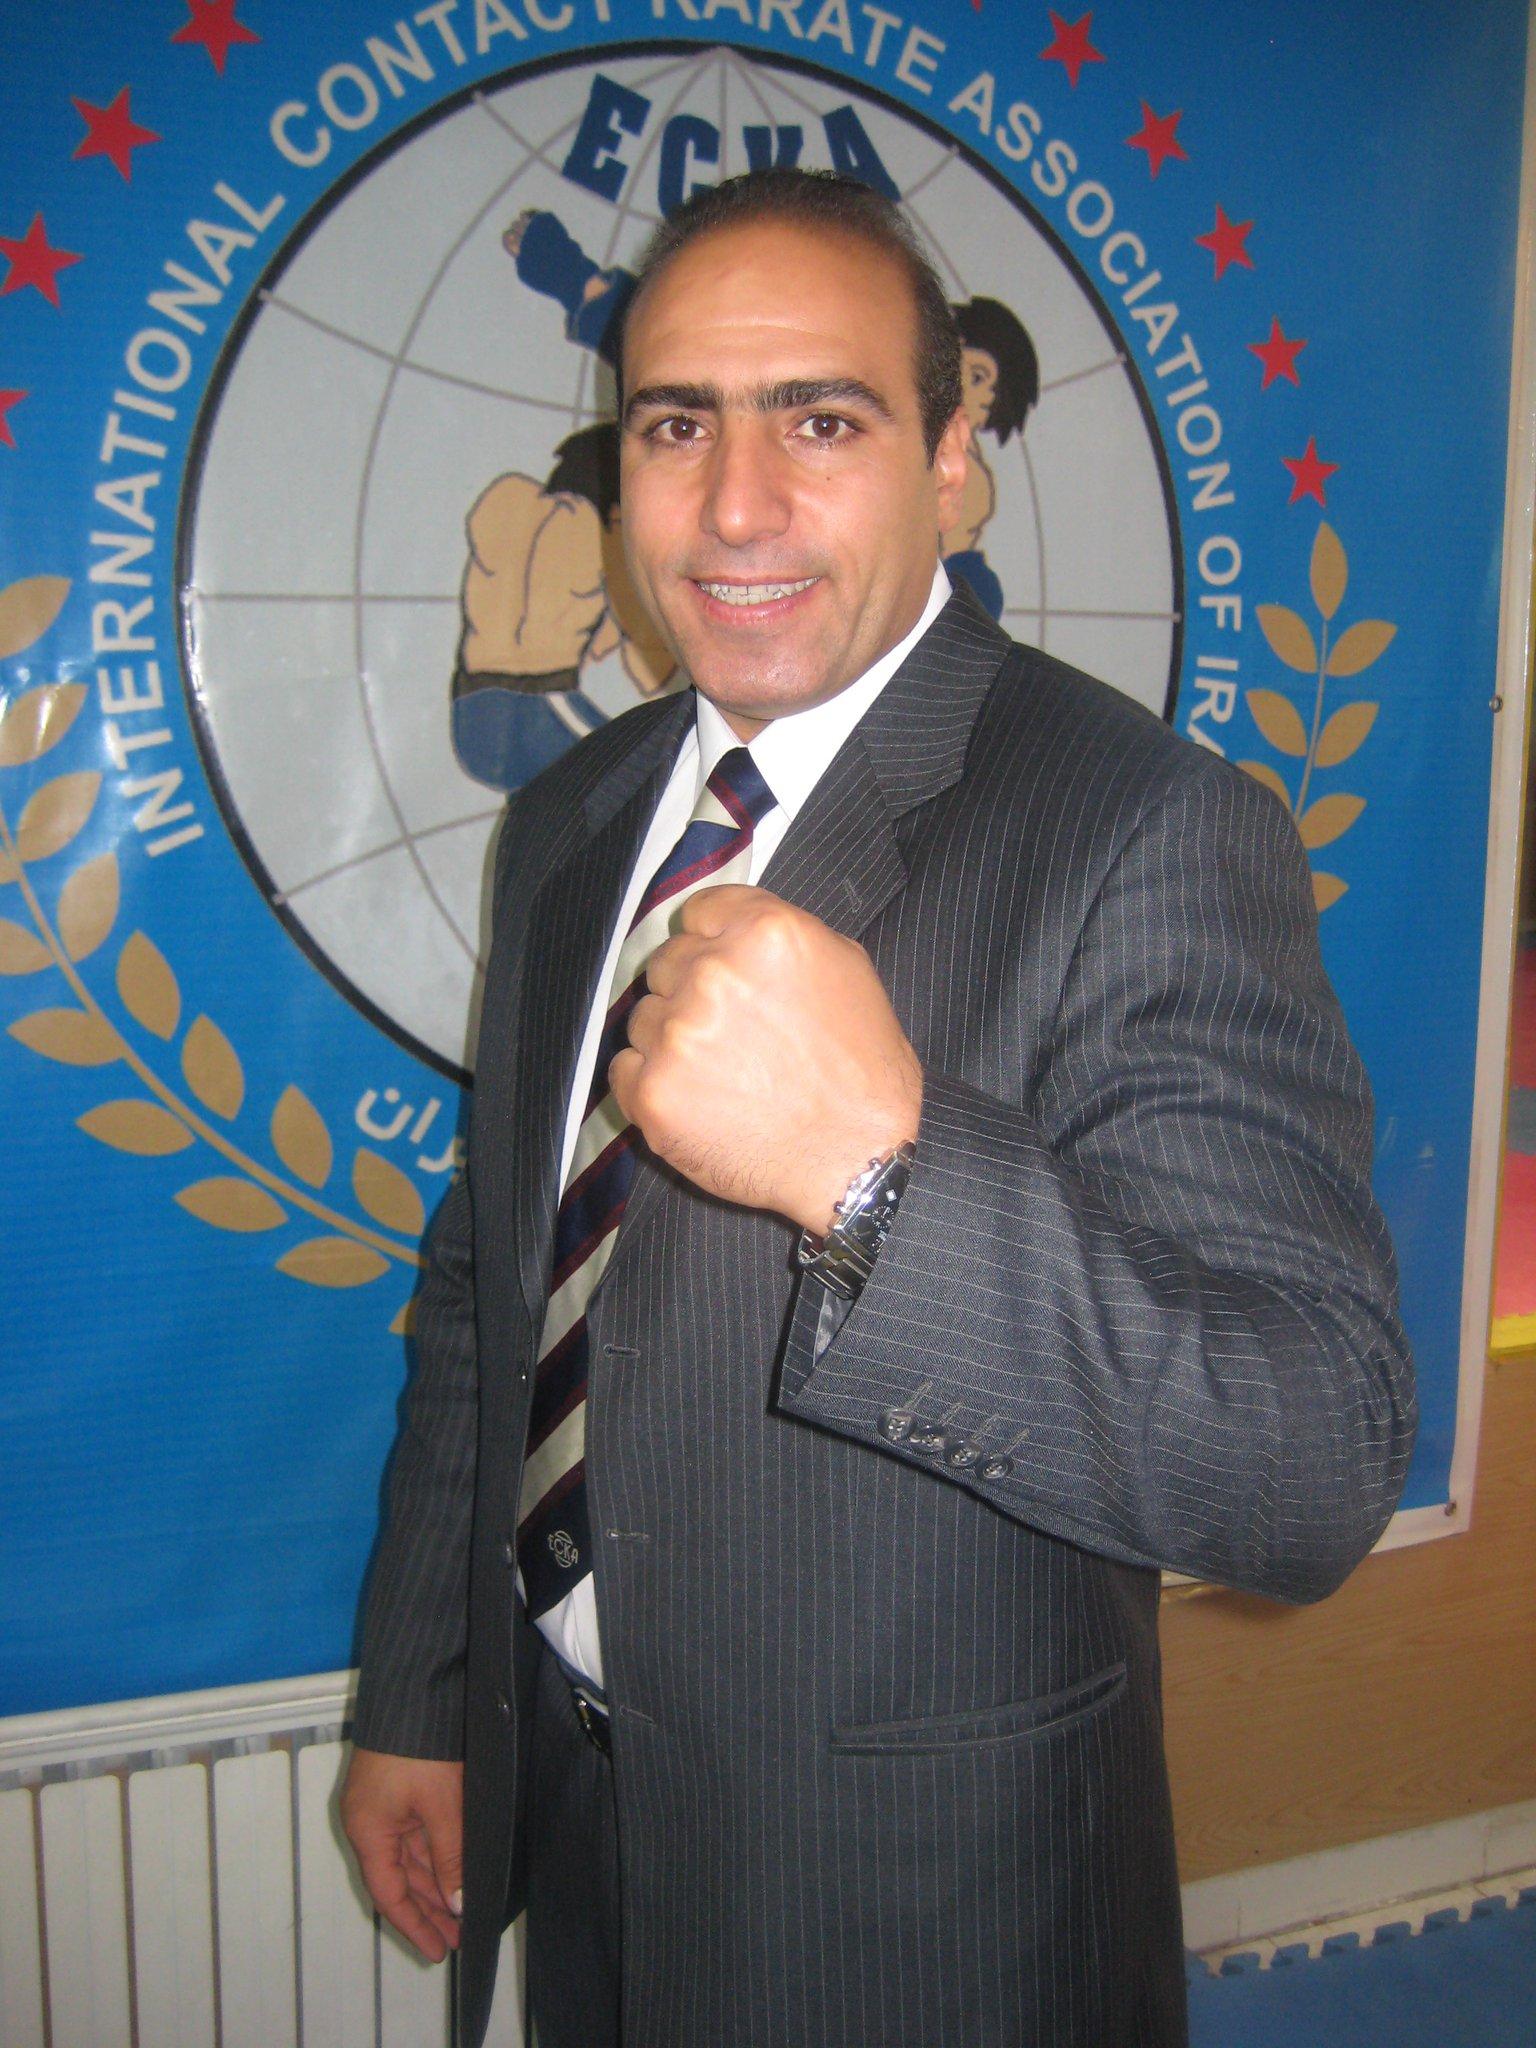 Asgar Azadian, member from Iran